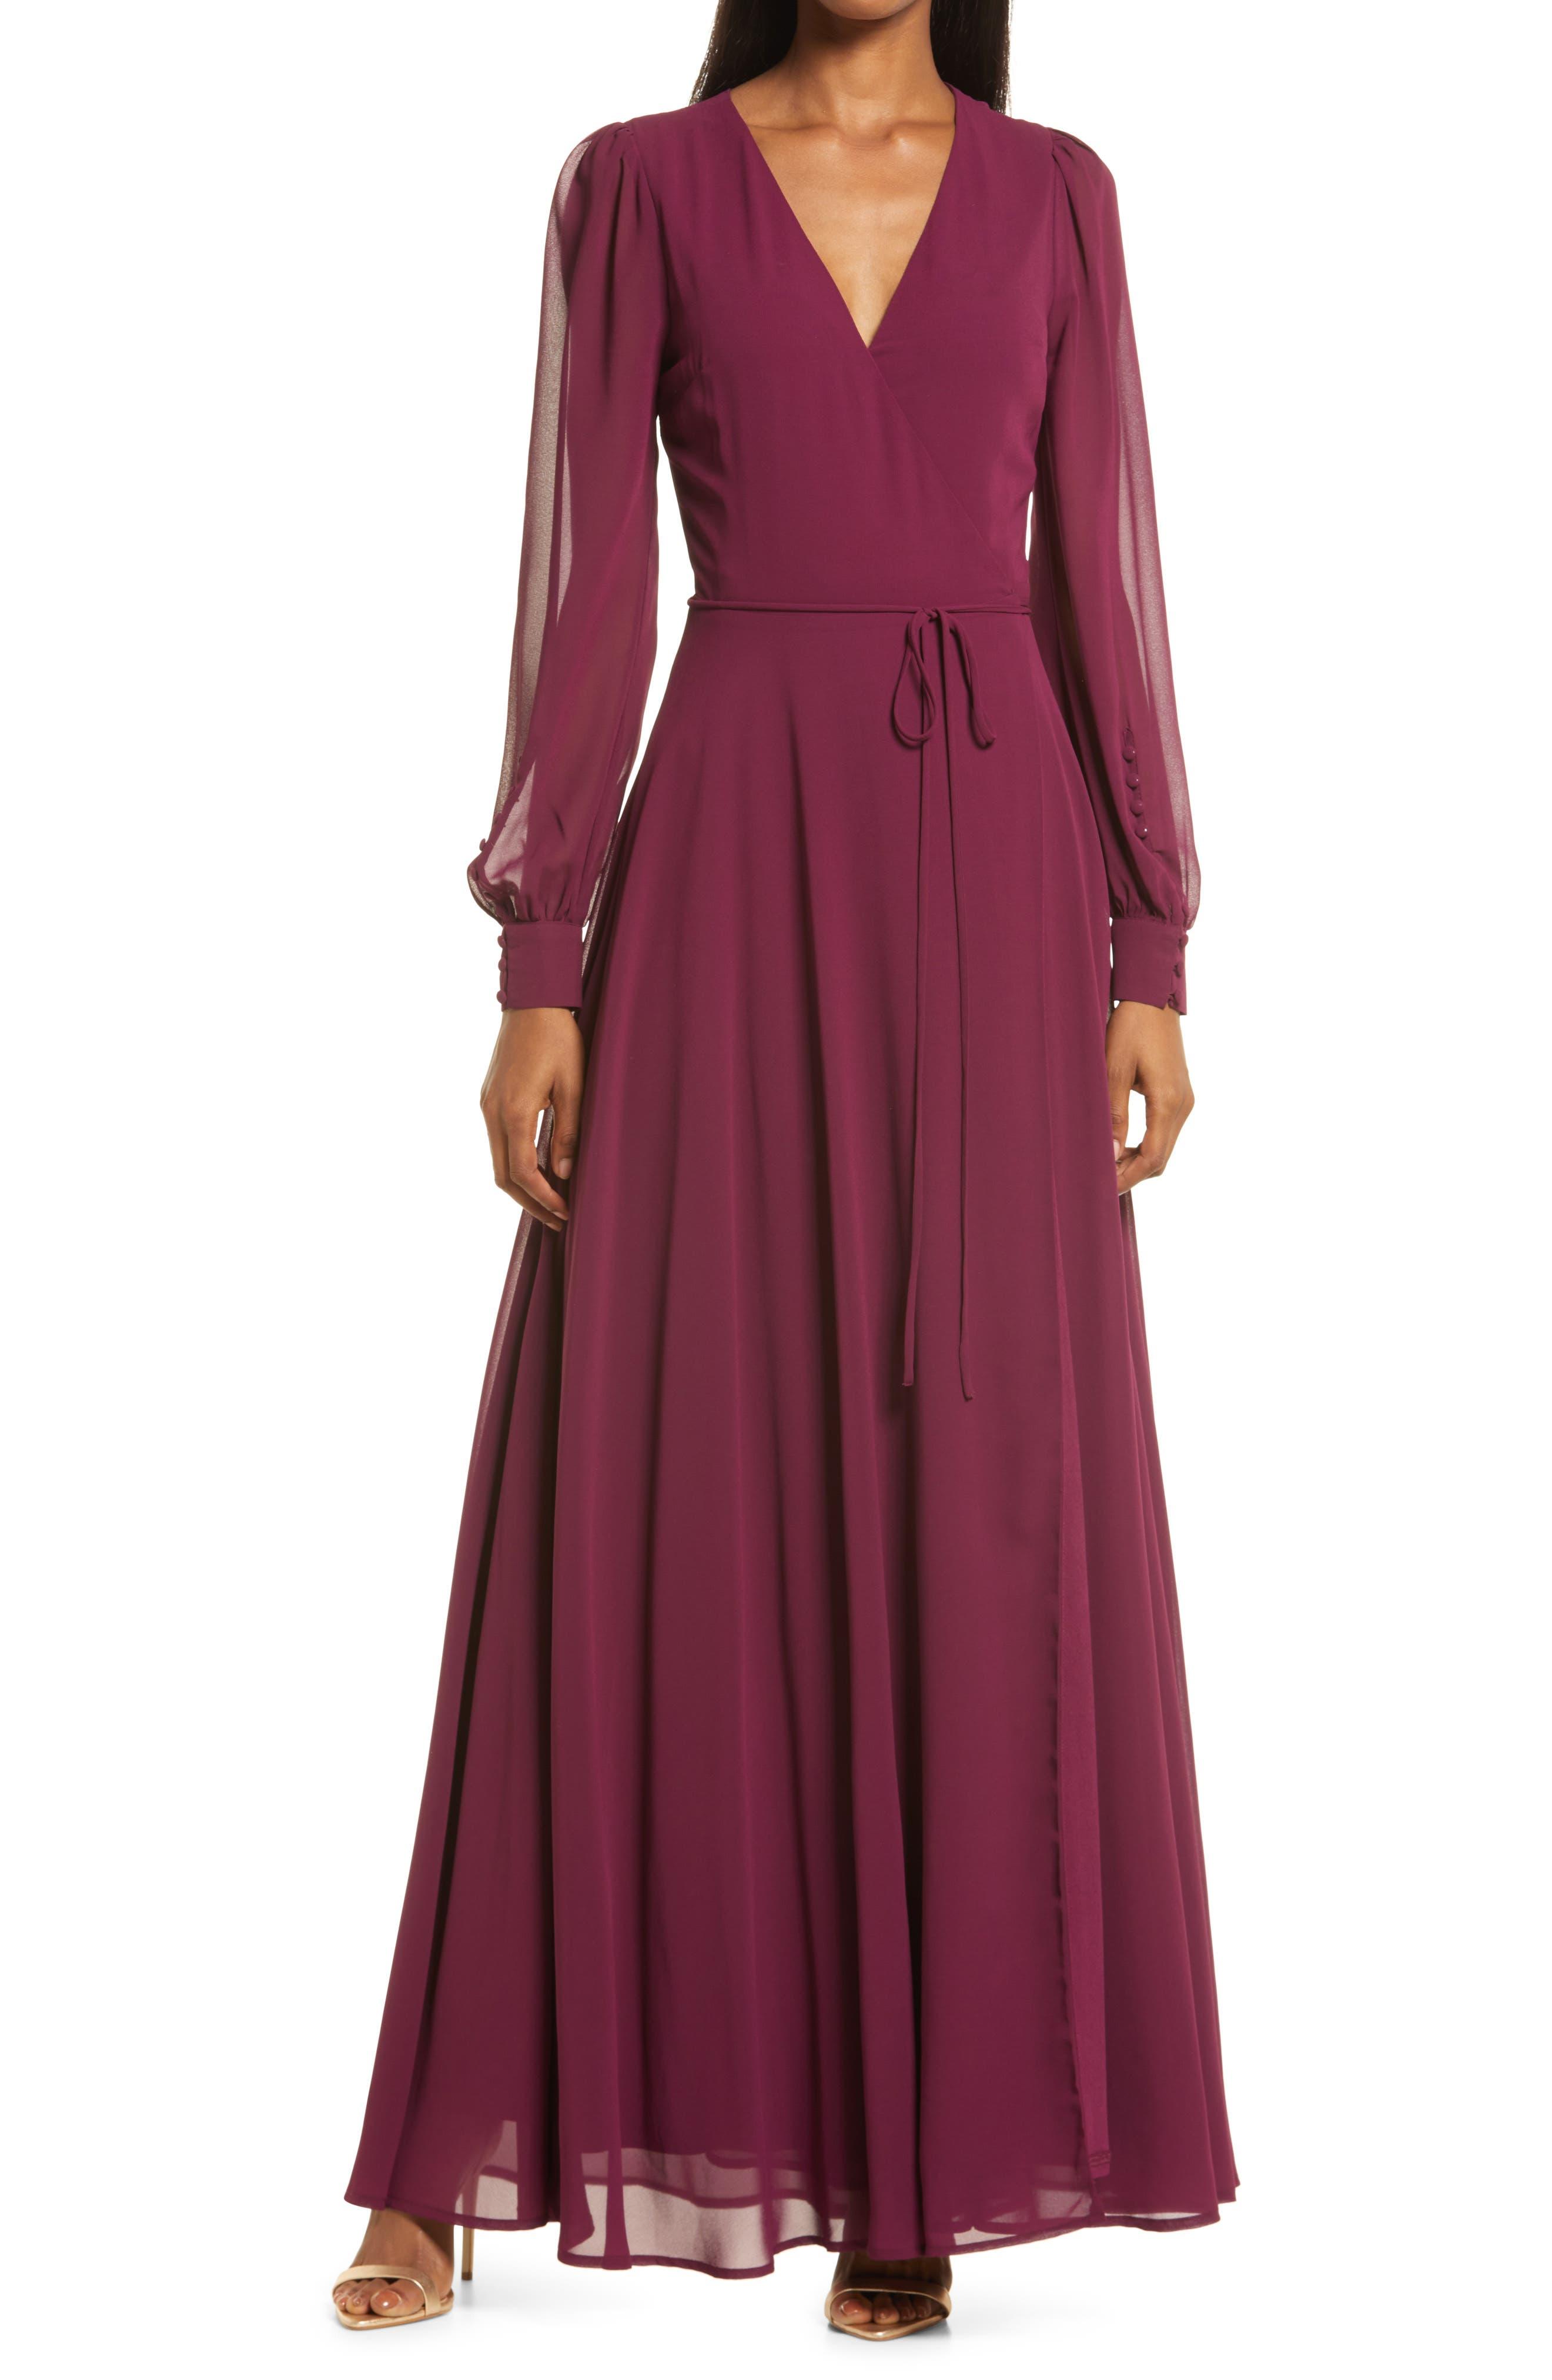 70s Sequin Dresses, Disco Dresses Womens Lulus My Whole Heart Long Sleeve Wrap Gown Size Medium - Burgundy $74.00 AT vintagedancer.com